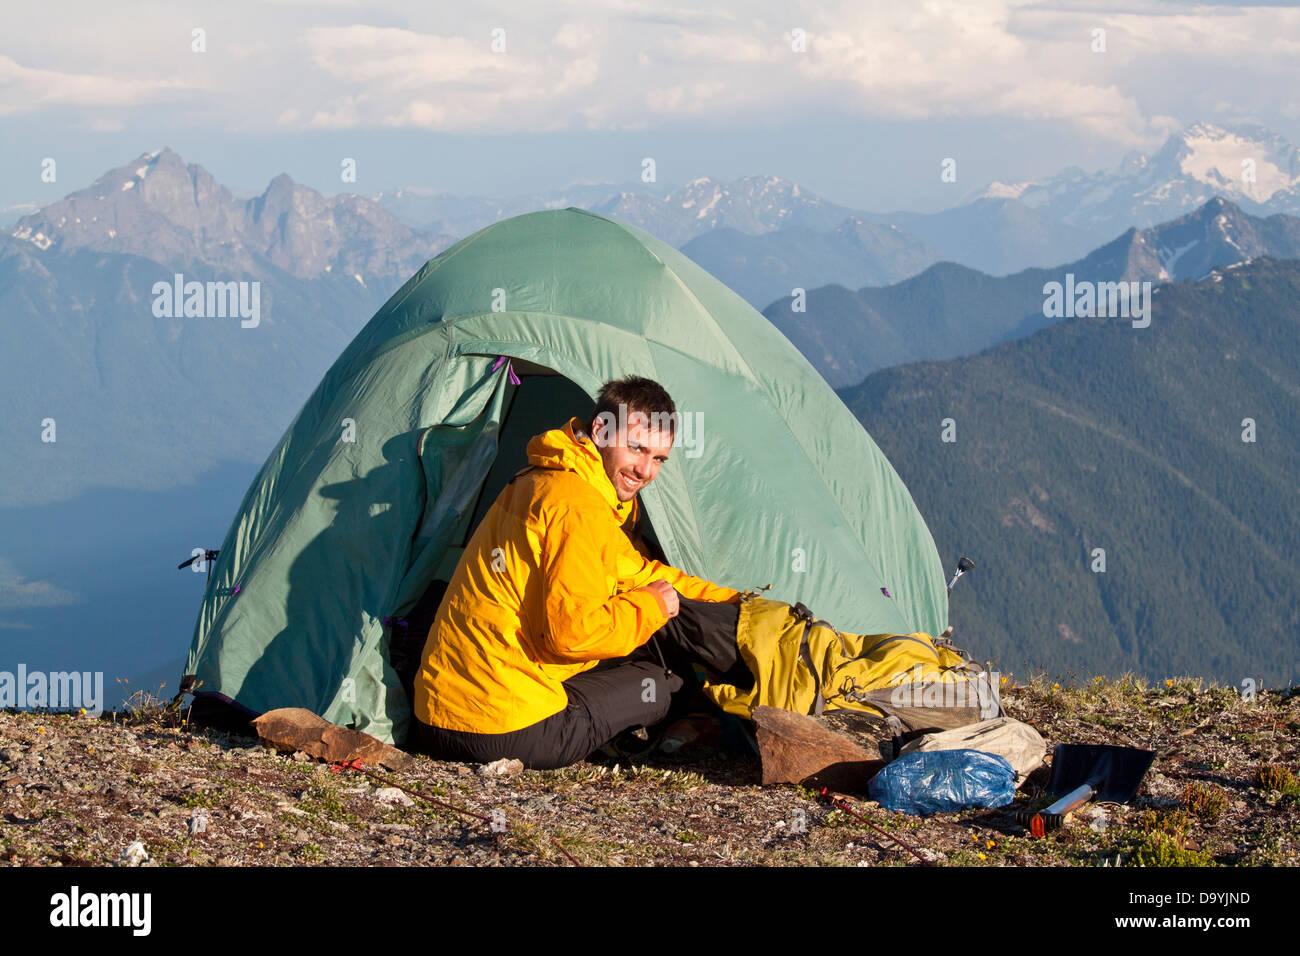 Hike to Silvertip Mountain - Stock Image